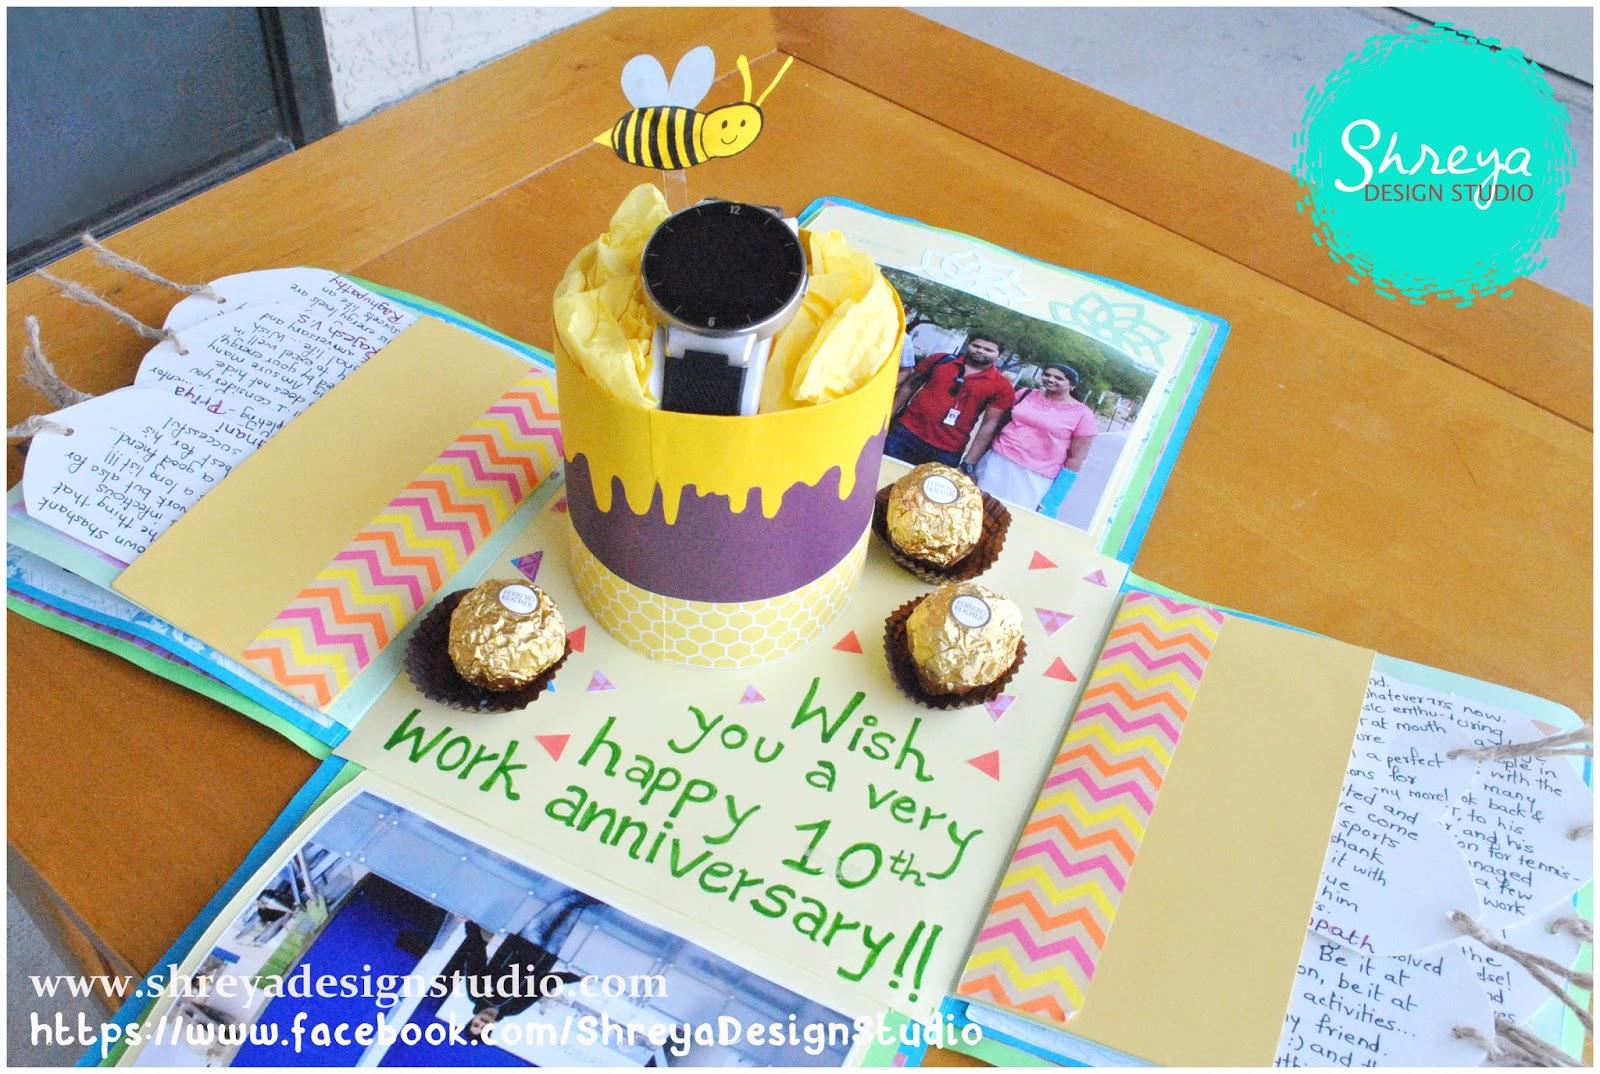 Explosion Box Card For 10th Work Anniversary Shreya Design Studio